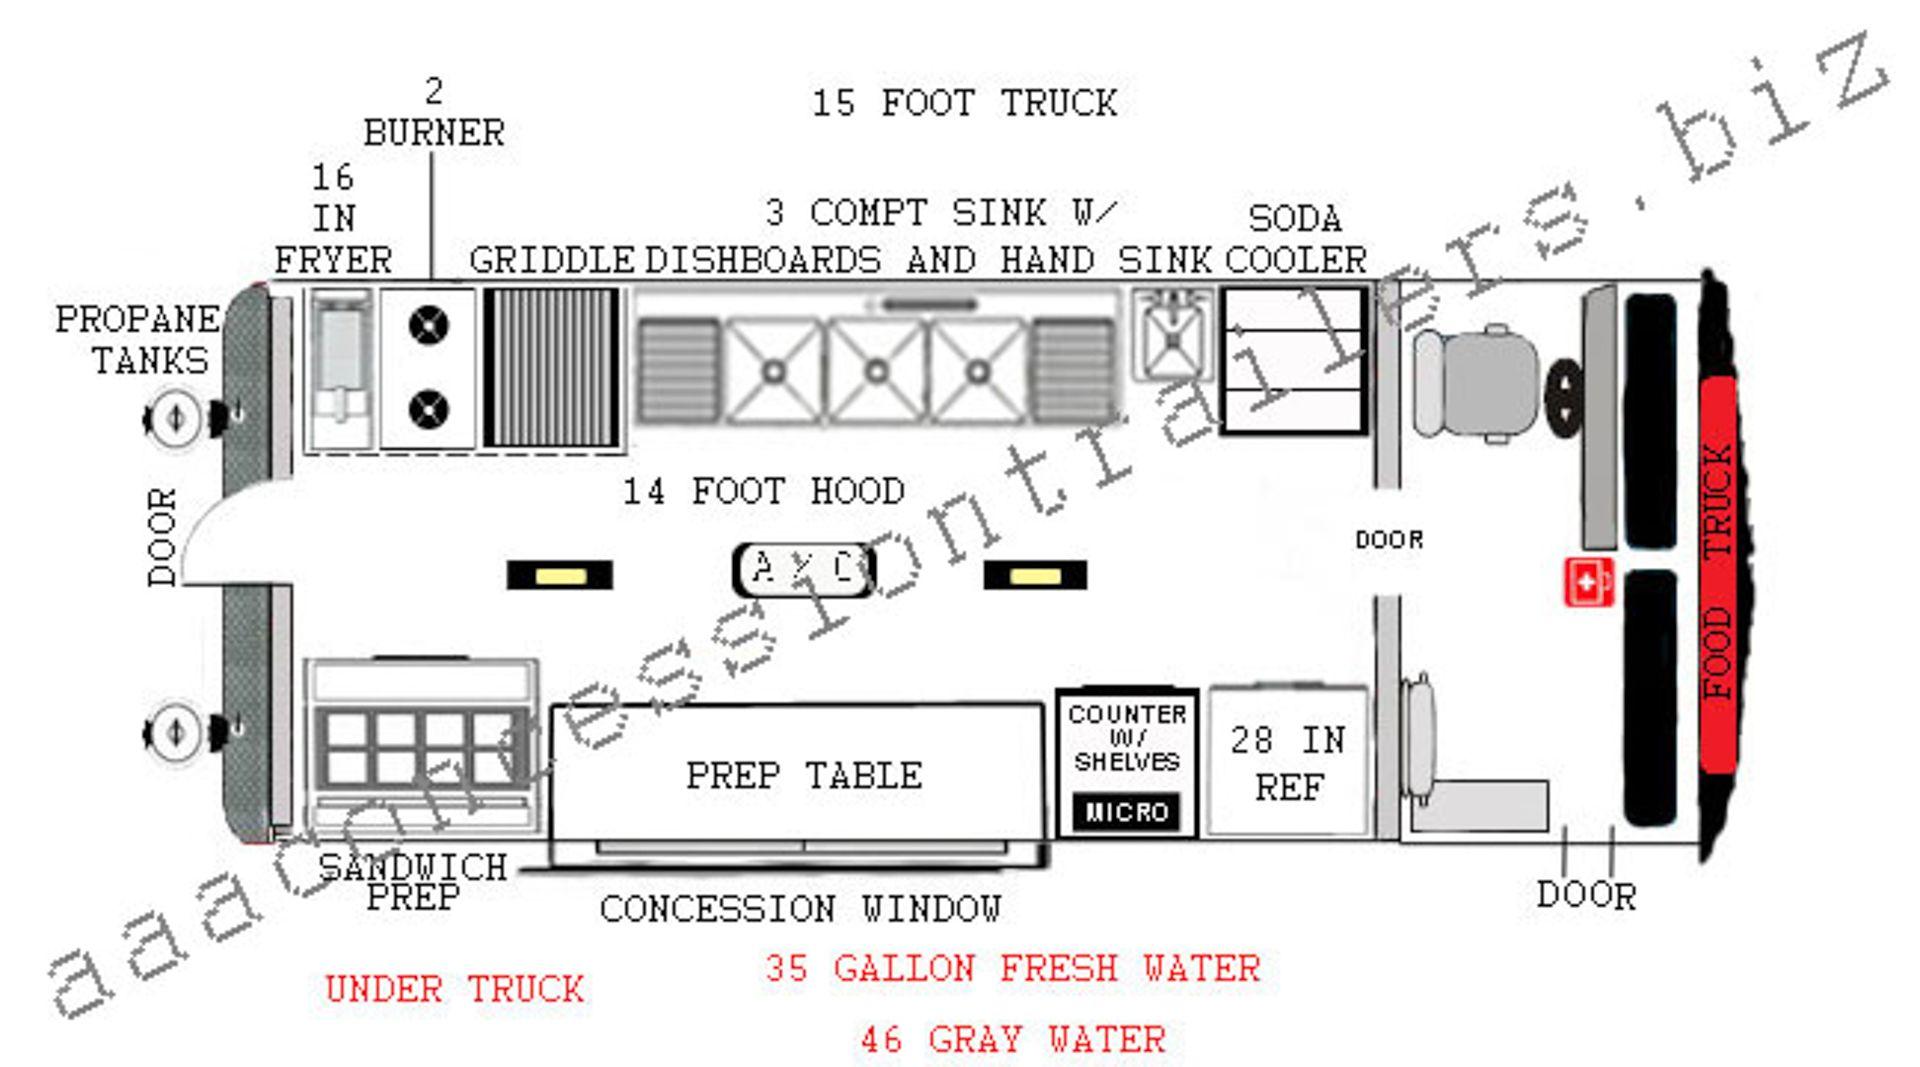 Food Truck Plans Modulos Pinterest Food Truck Trucks and Food